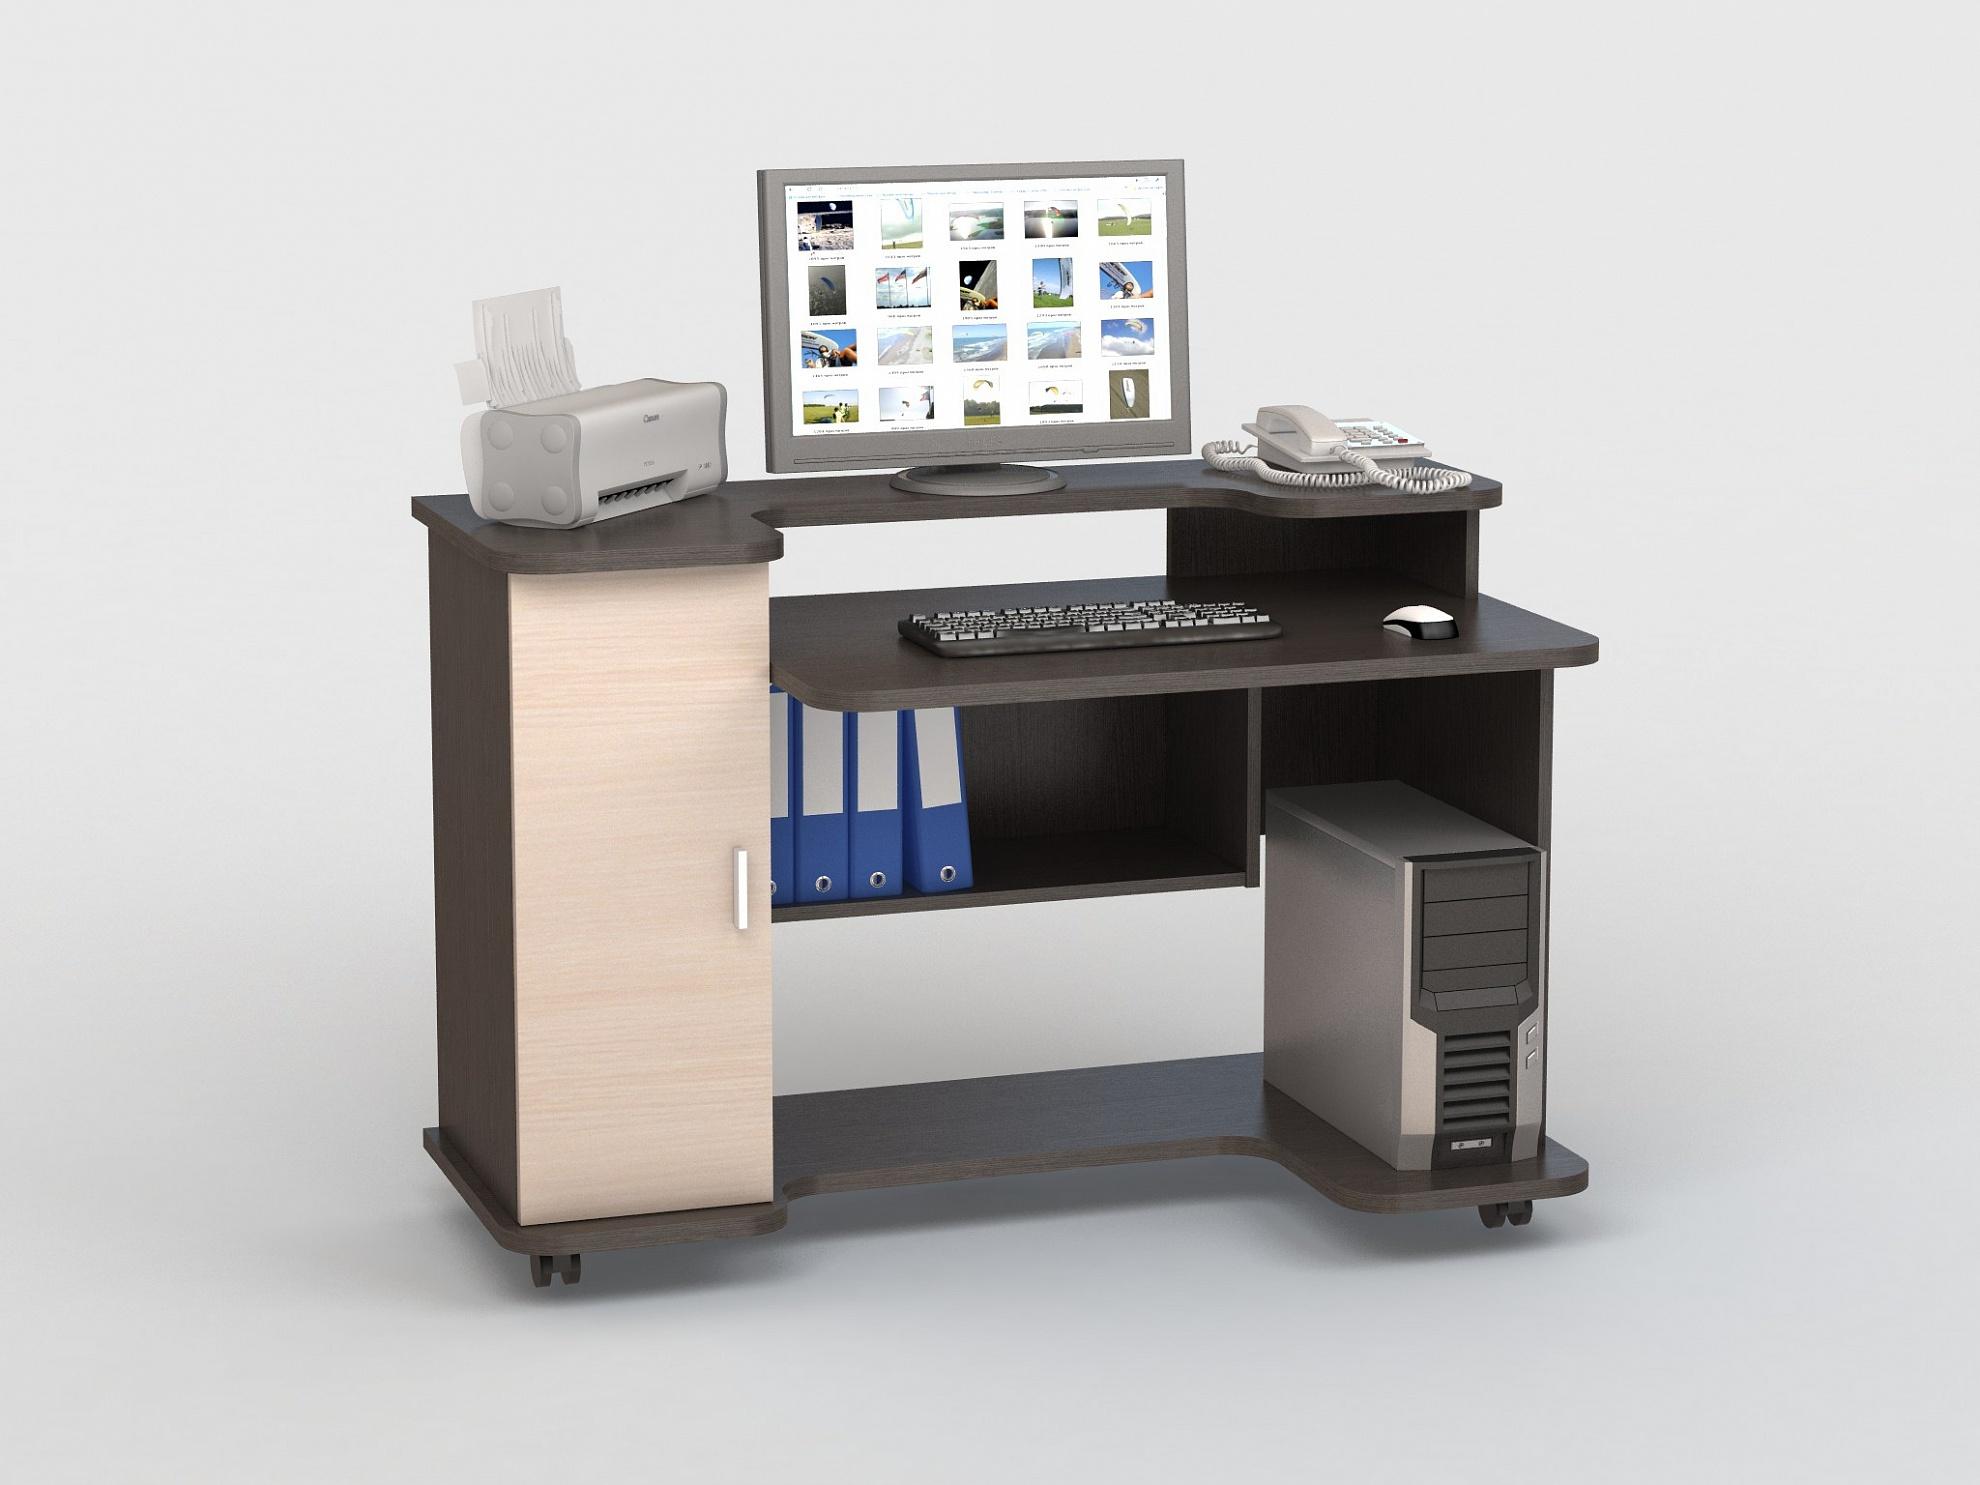 Компьютерный стол КС 20-12 компьютерный стол кс 20 16м3